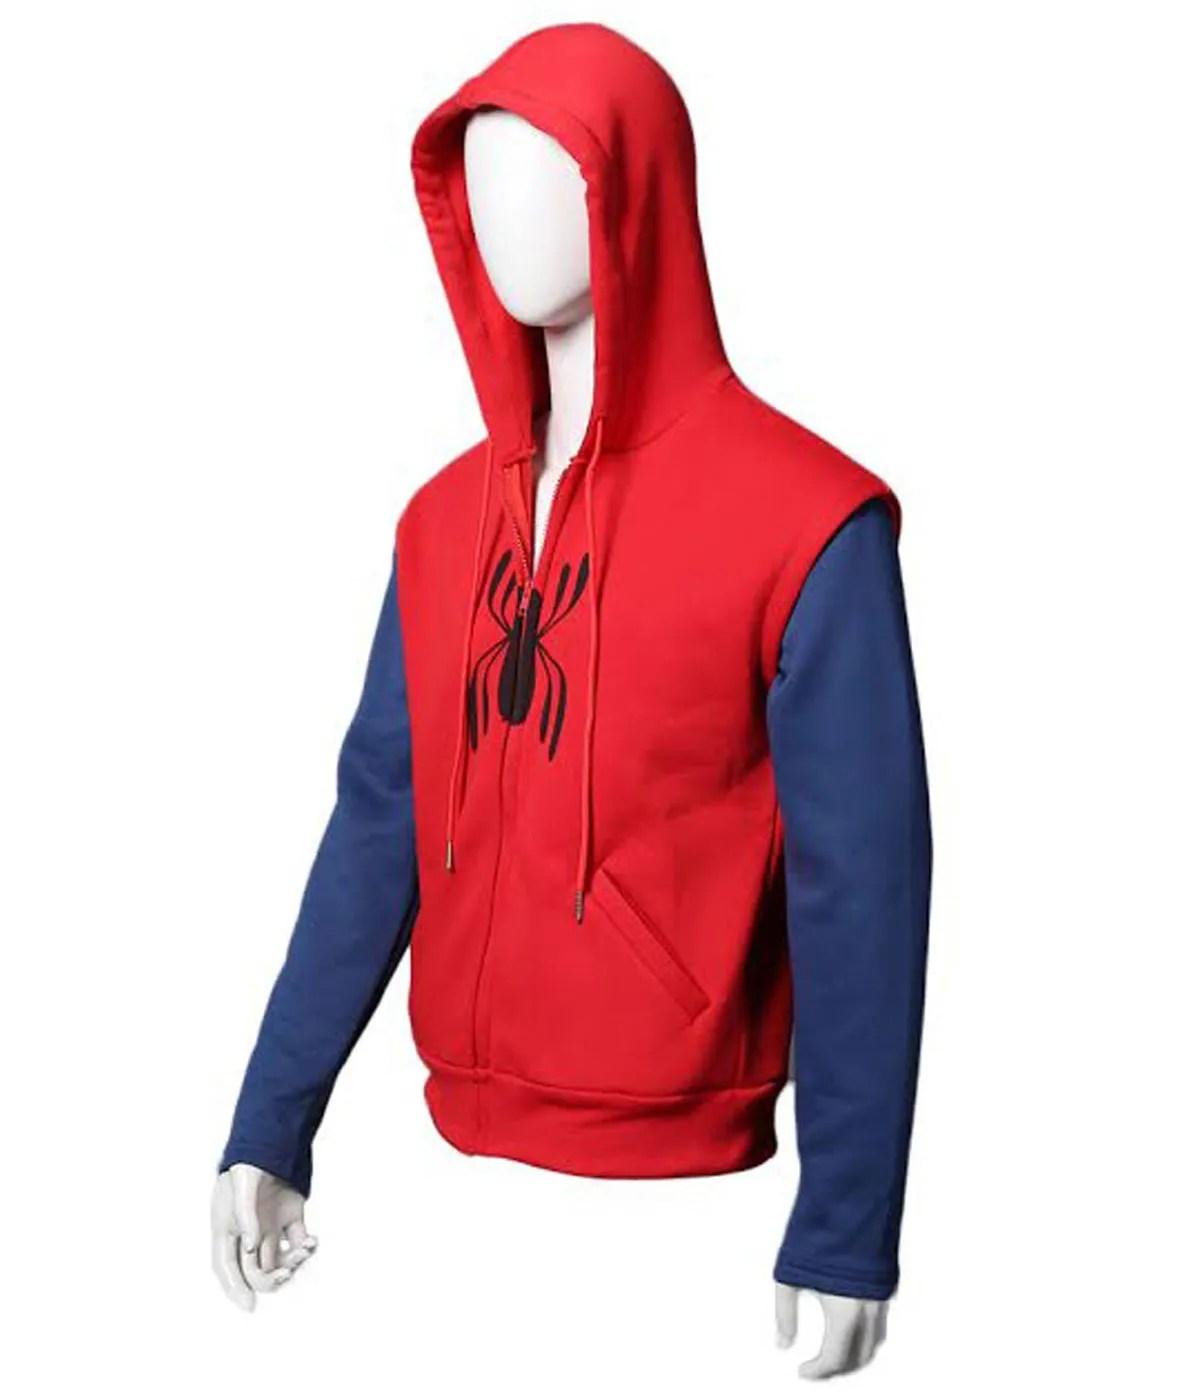 peter-parker-tom-holand-spiderman-hoodie